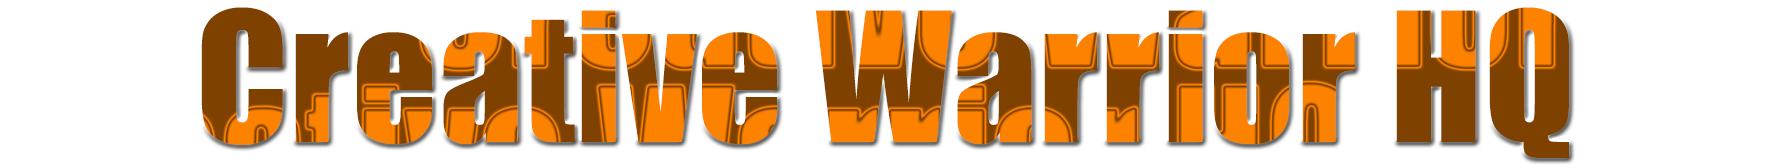 Creative Warrior Website Design & Digital Marketing Logo